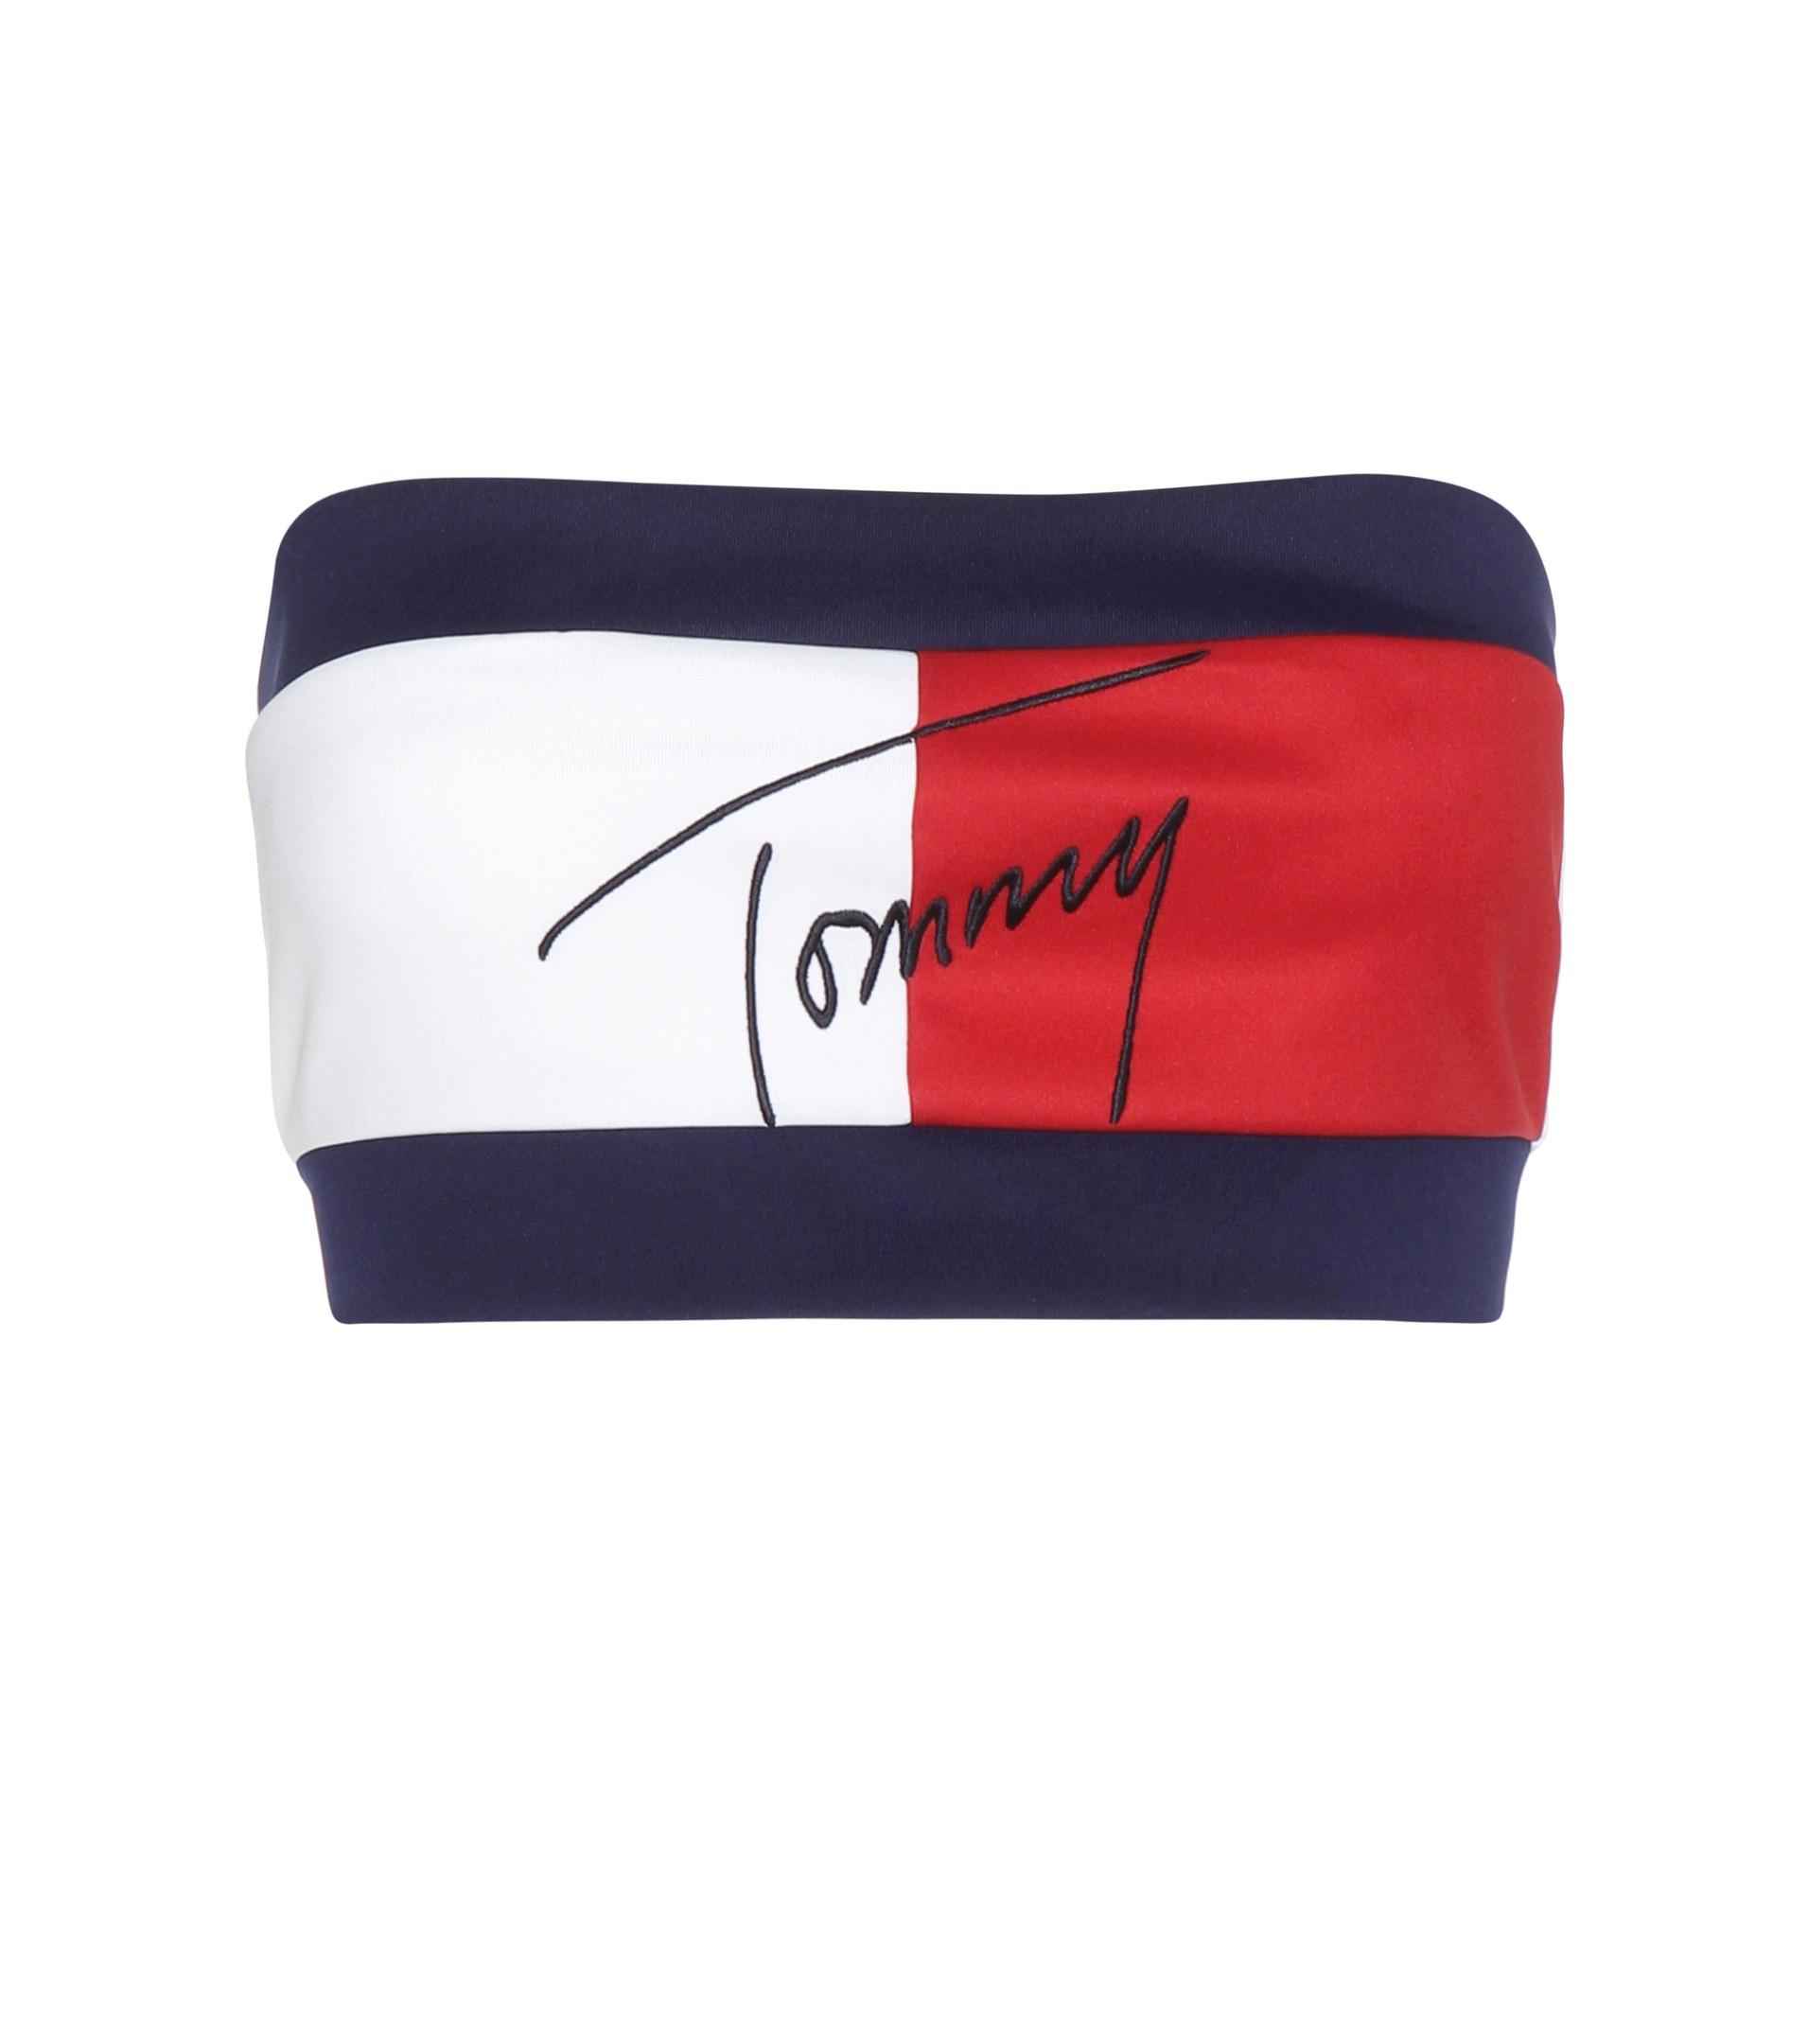 Tommy hilfiger Mytheresa.com Exclusive Flag Embroidered ...